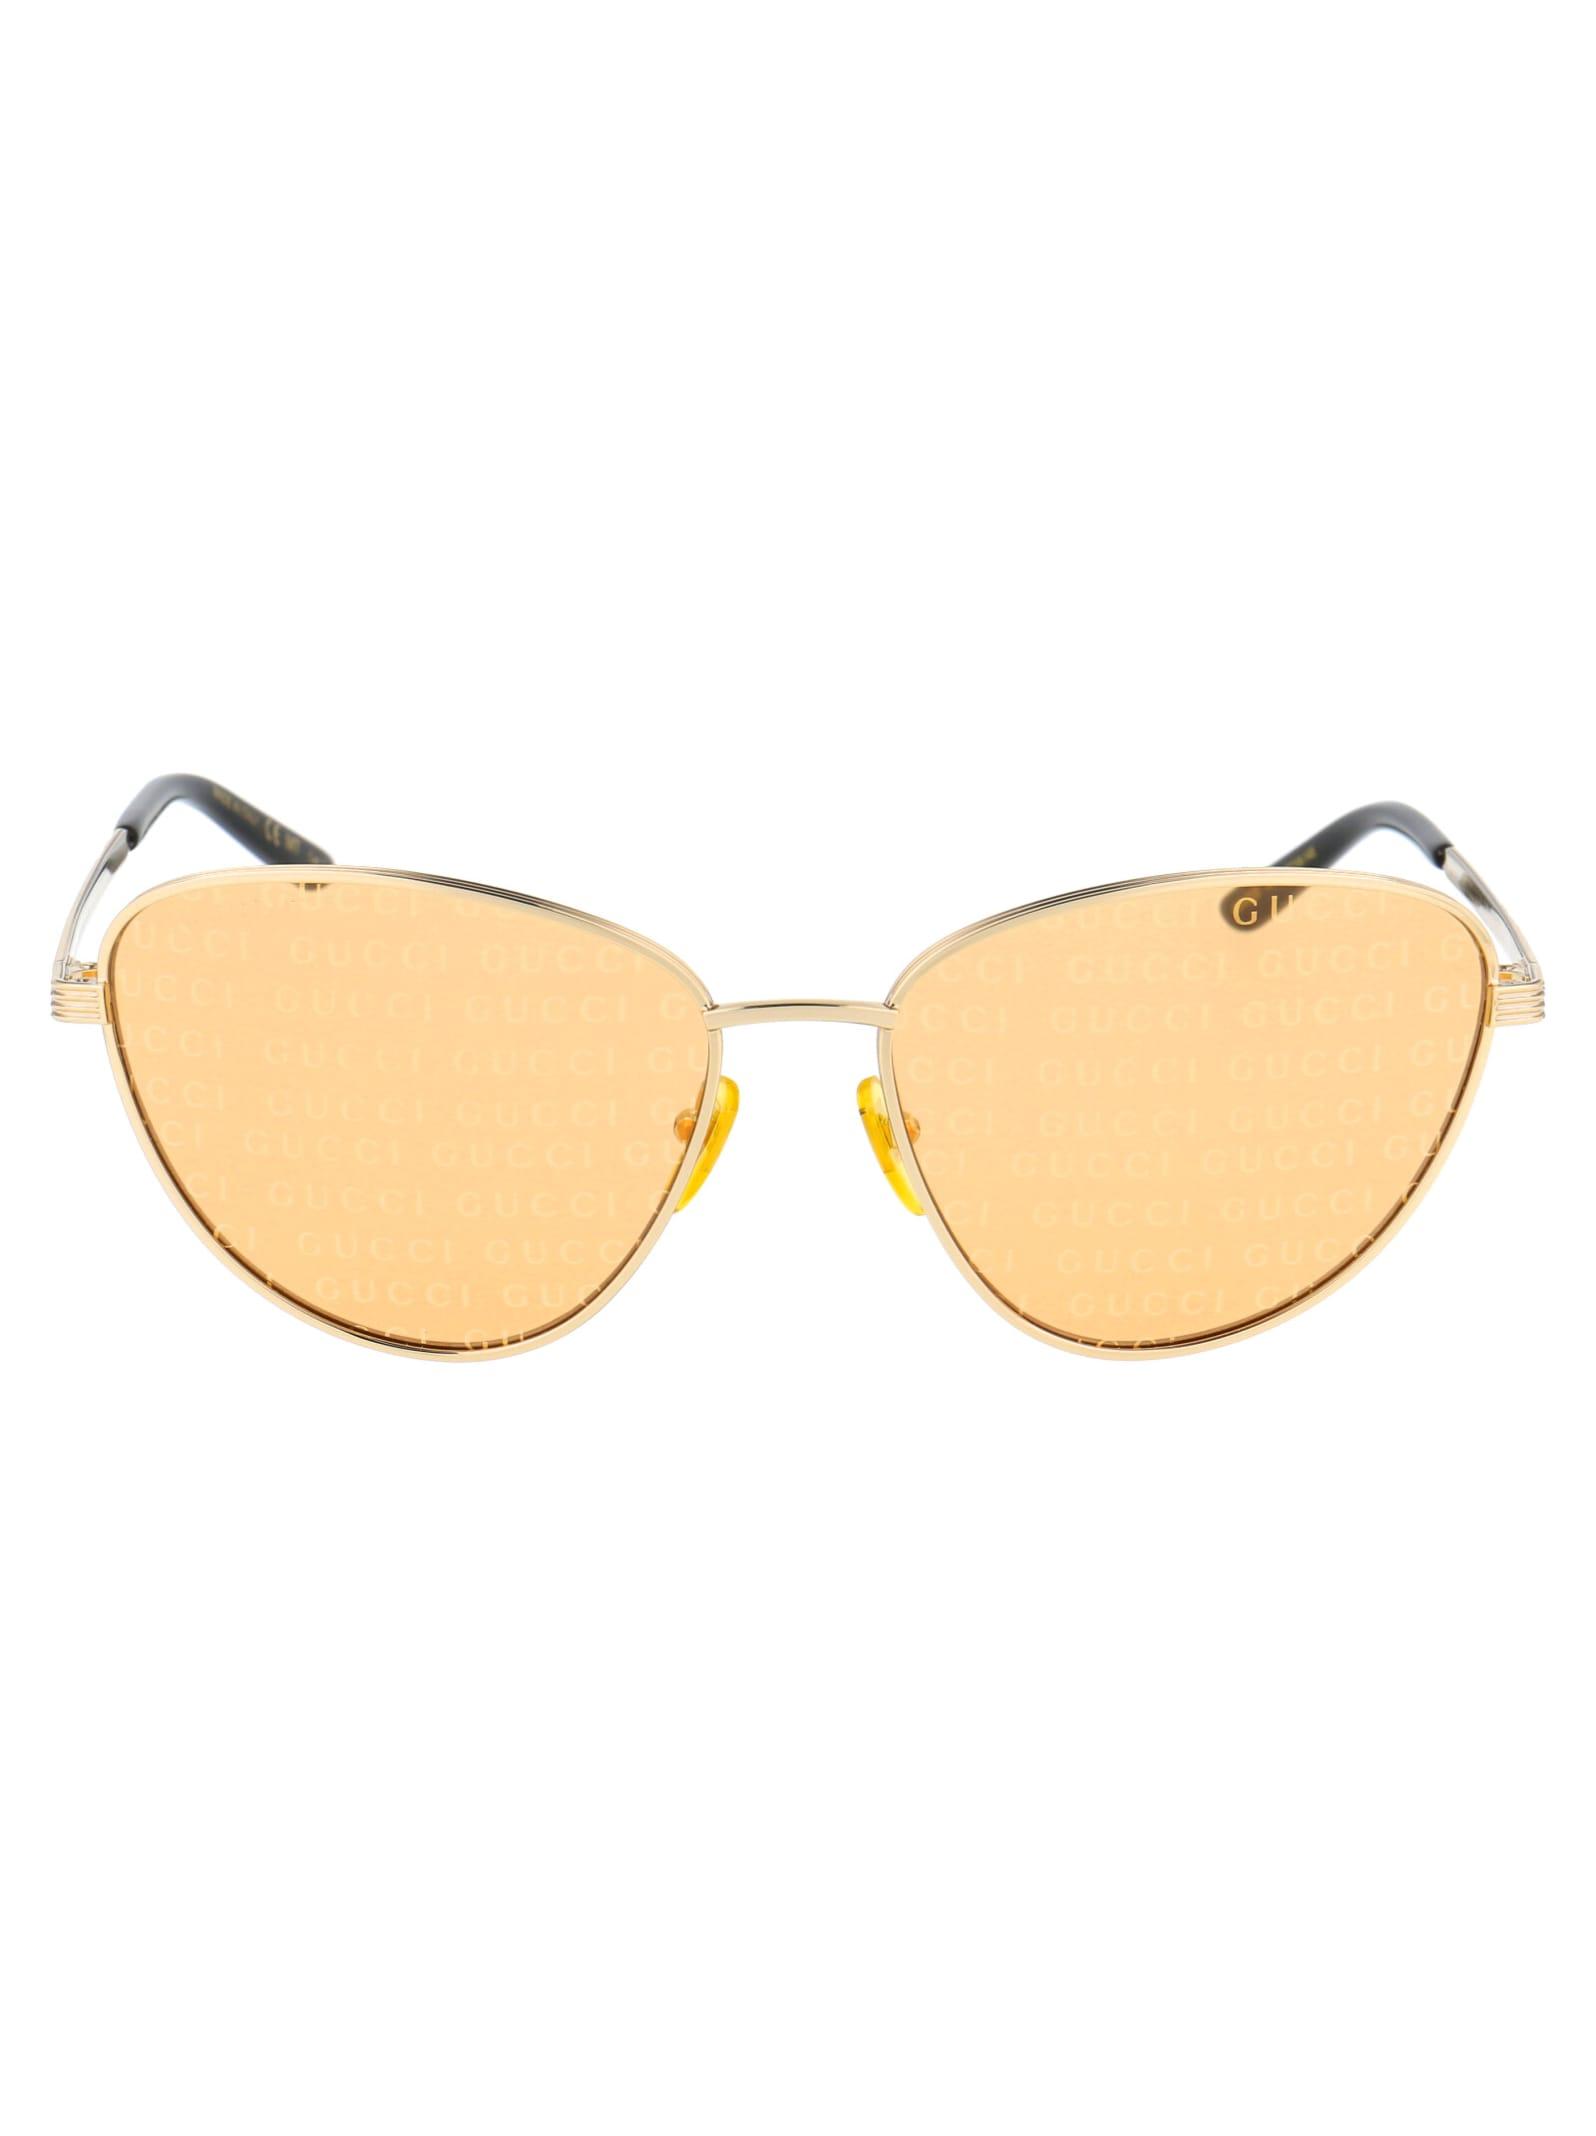 Gg0803s Sunglasses